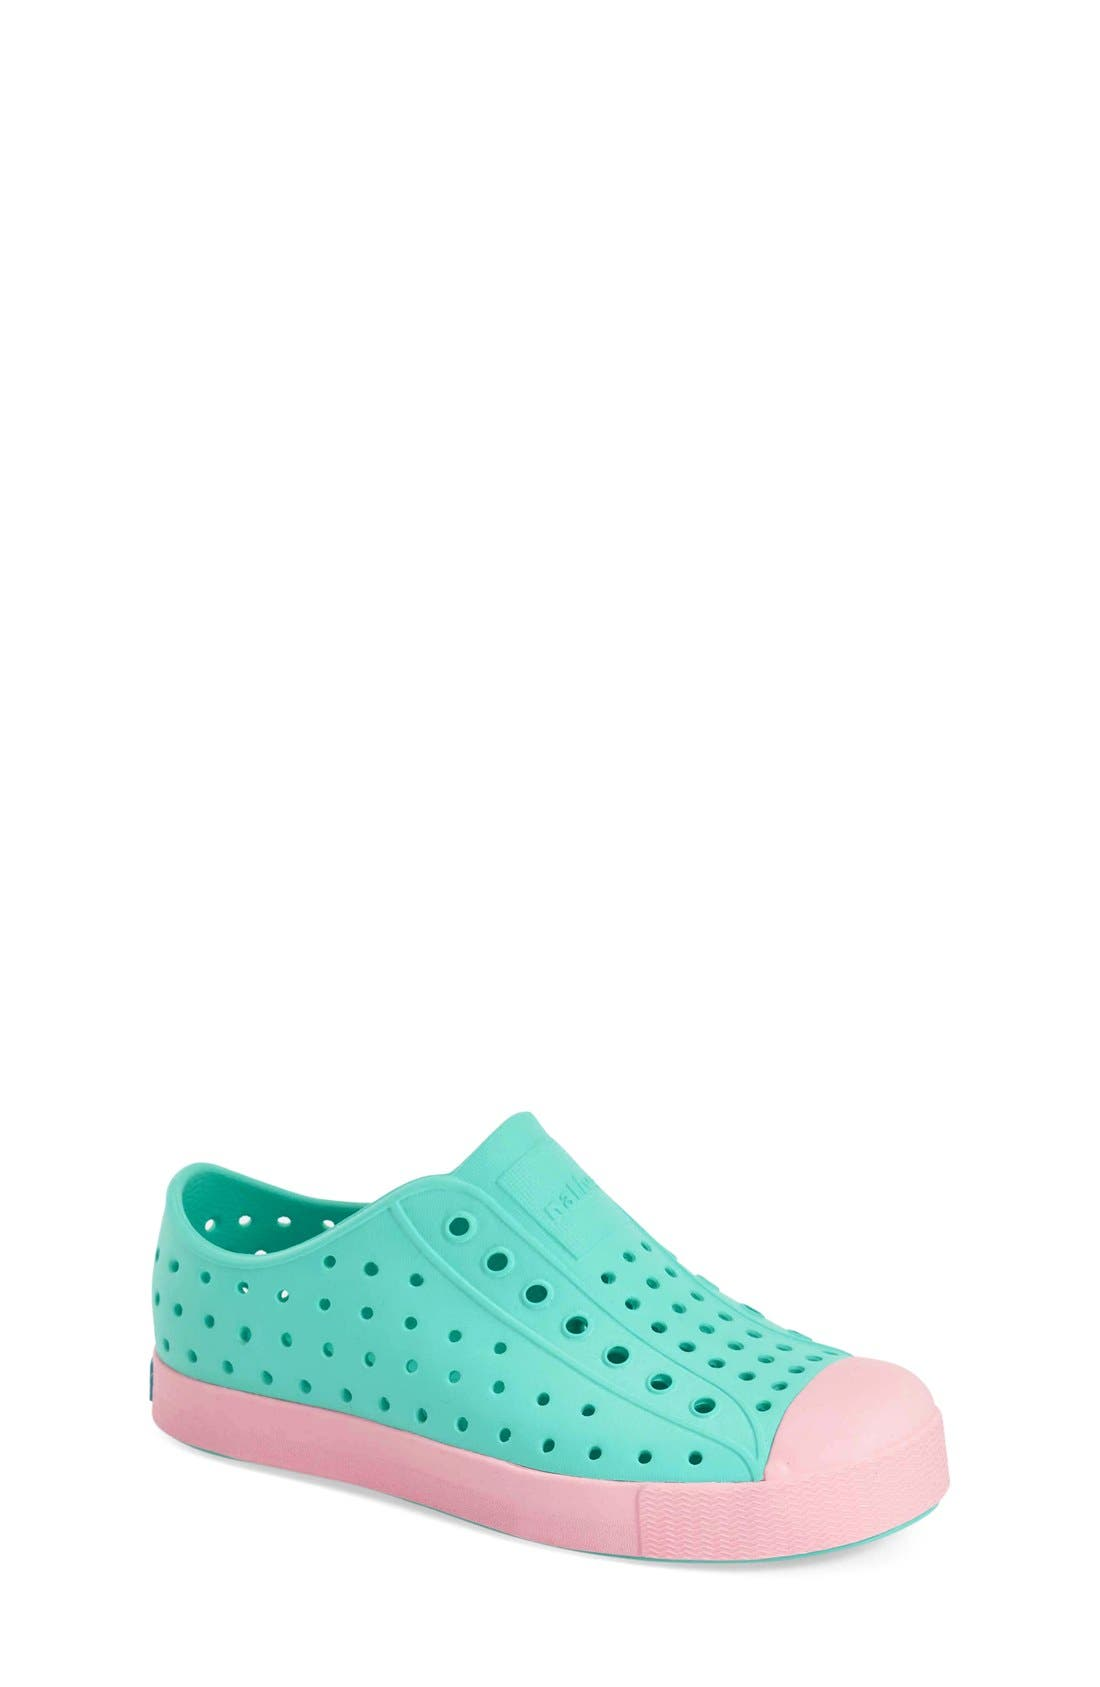 'Jefferson' Water Friendly Slip-On Sneaker,                             Main thumbnail 50, color,